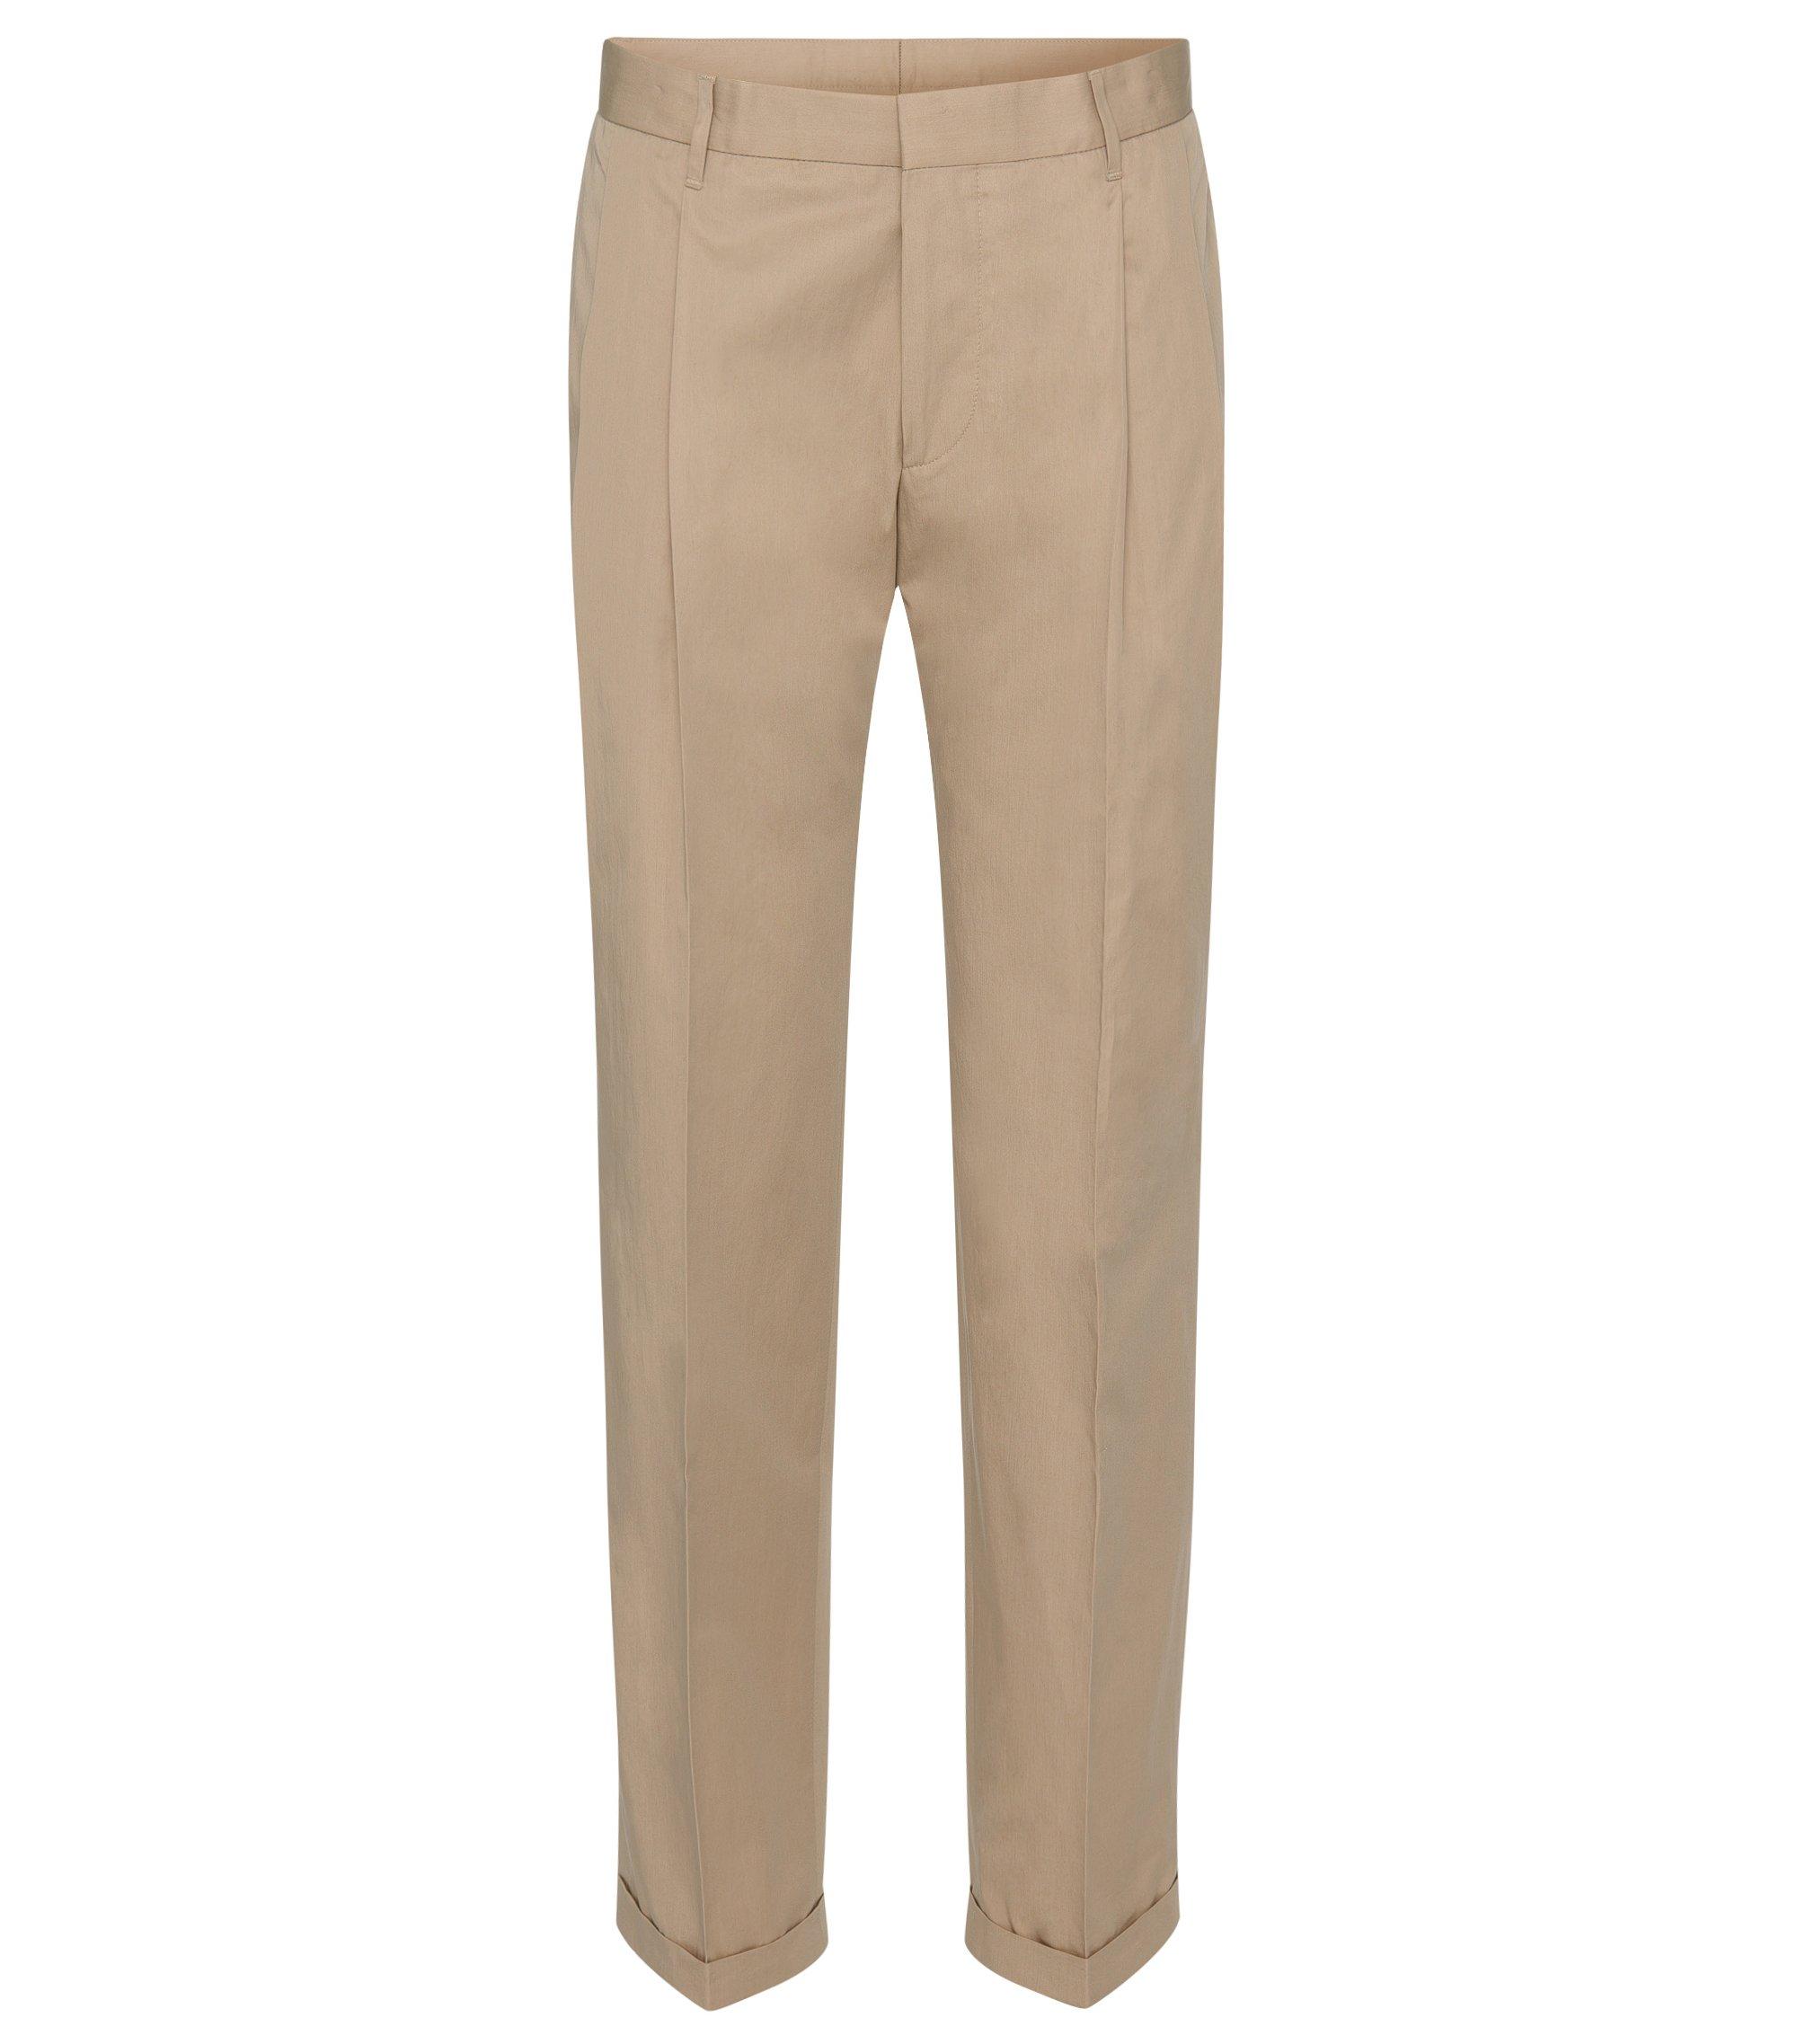 Cotton Pleated Pant, Slim Fit | Paton, Open Beige